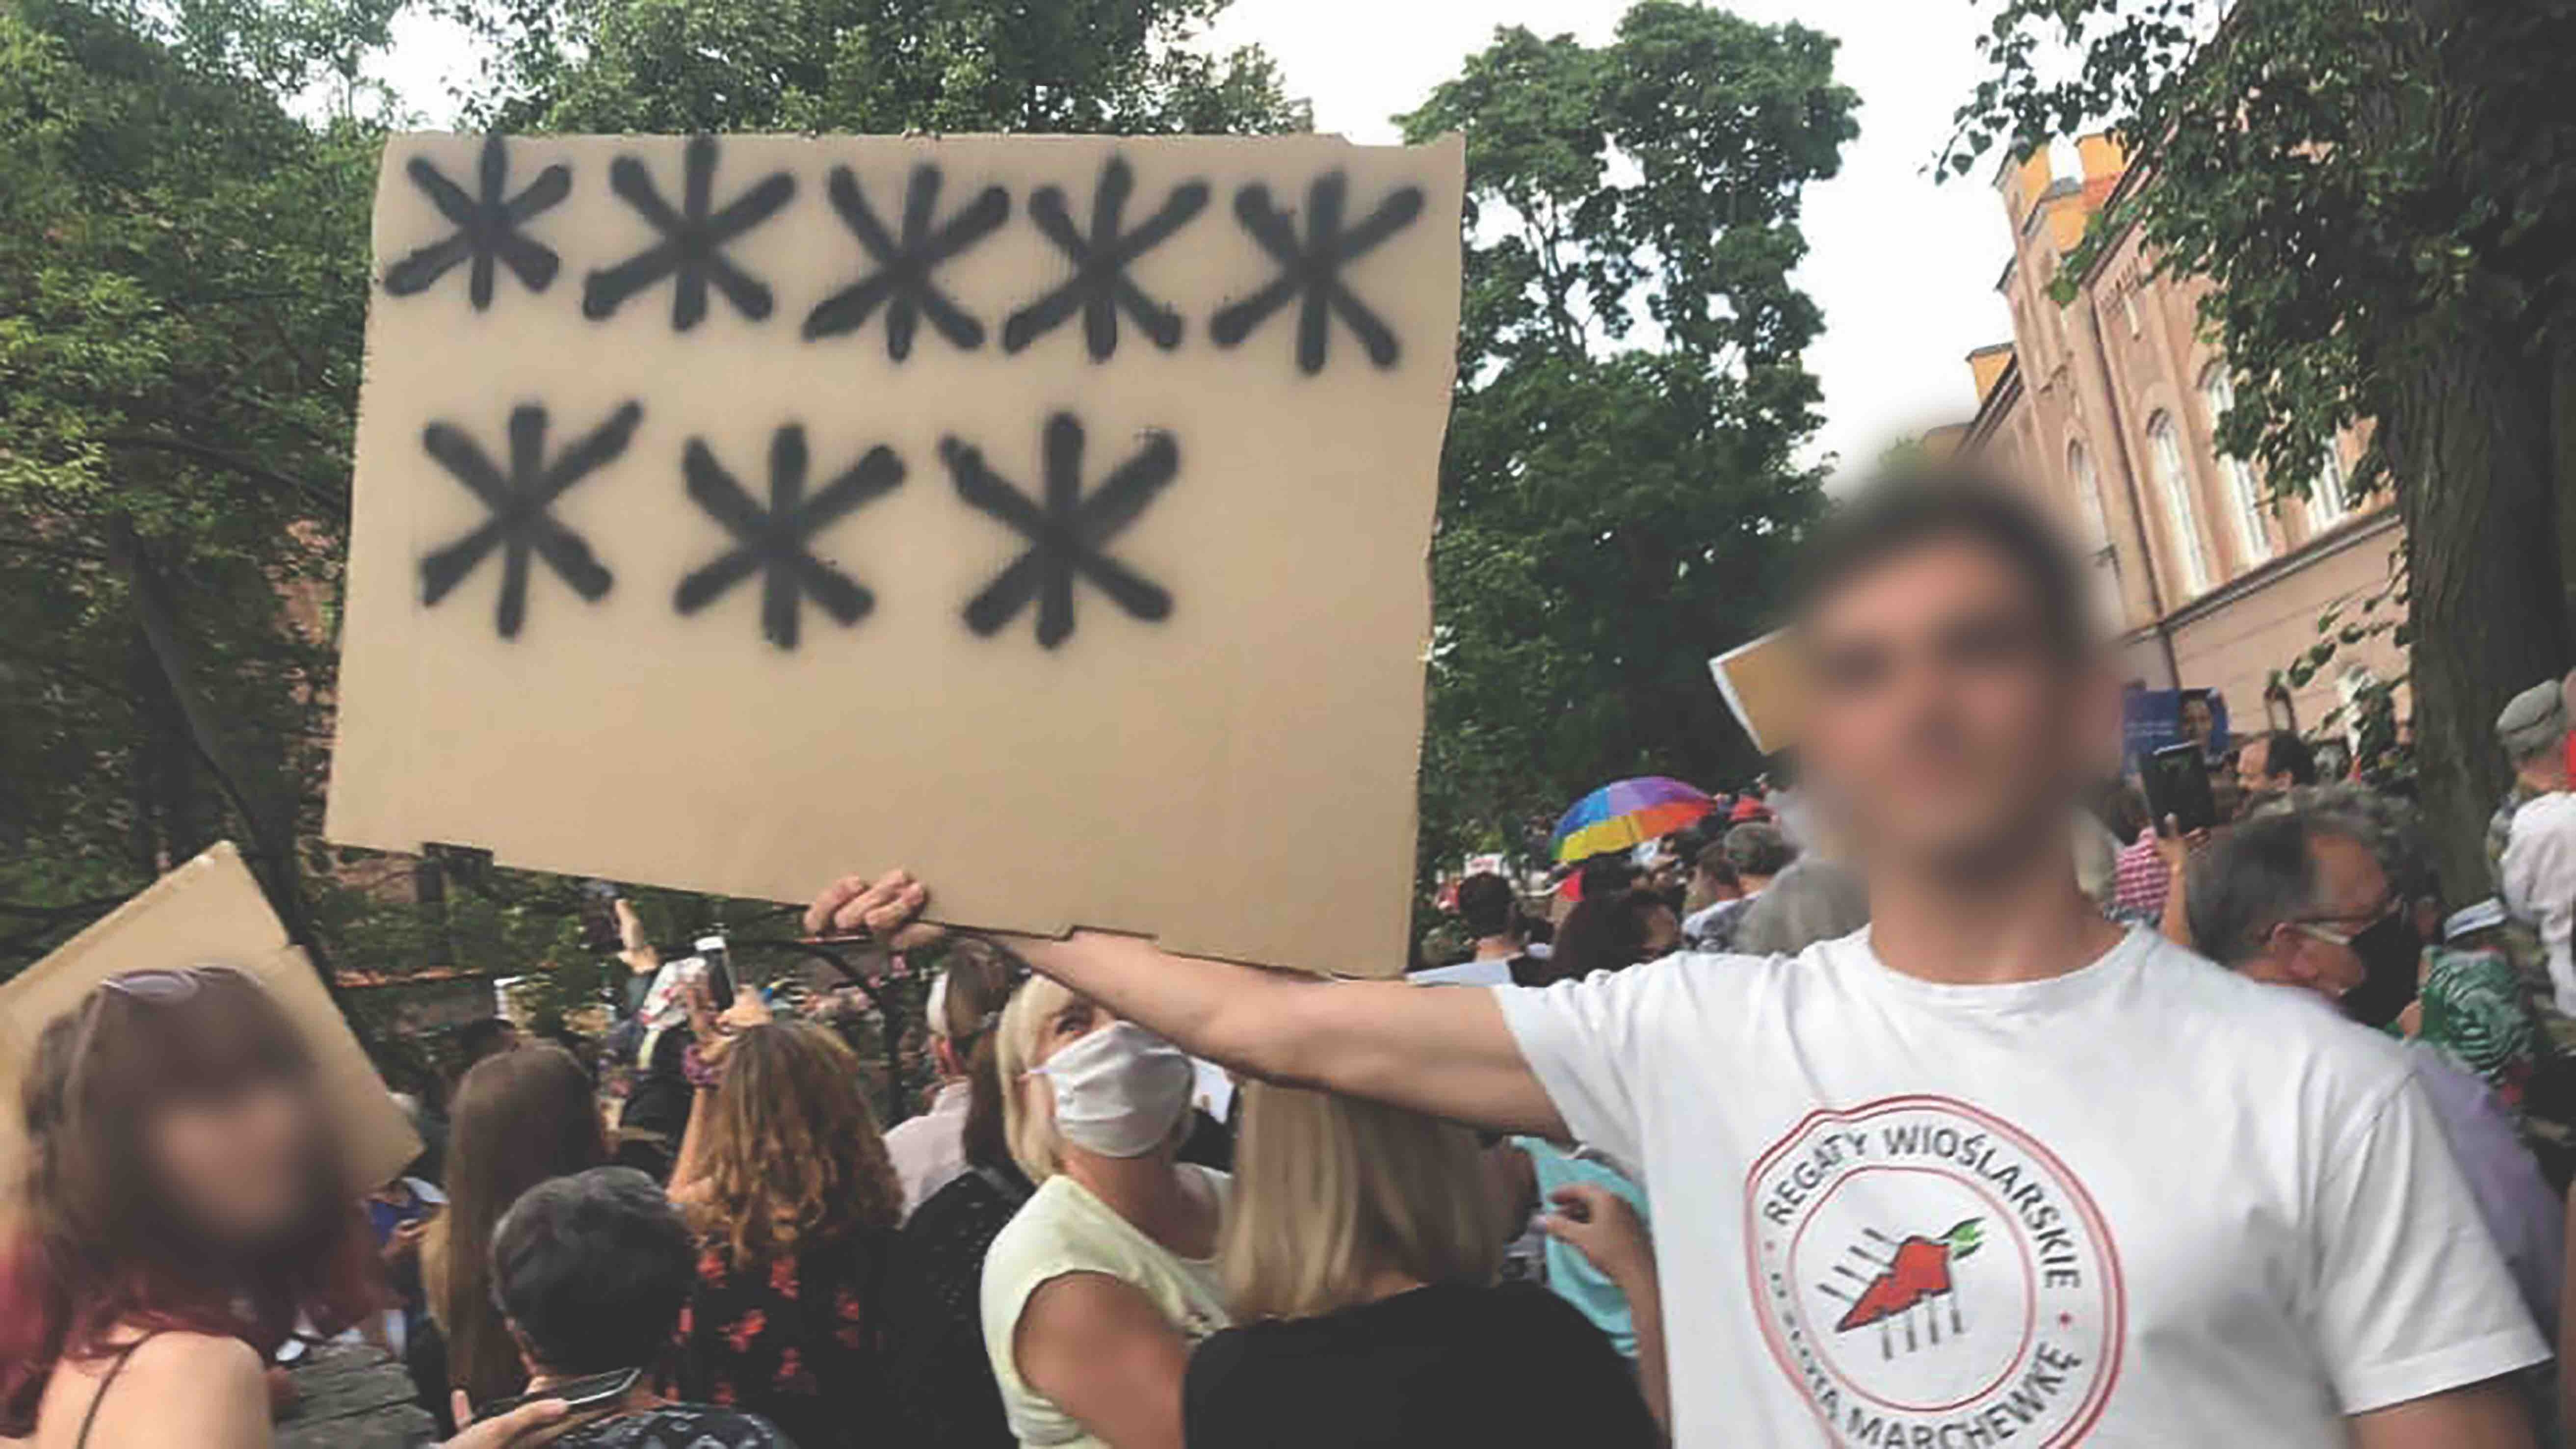 fot. Facebook.com/ruchosmiugwiazd